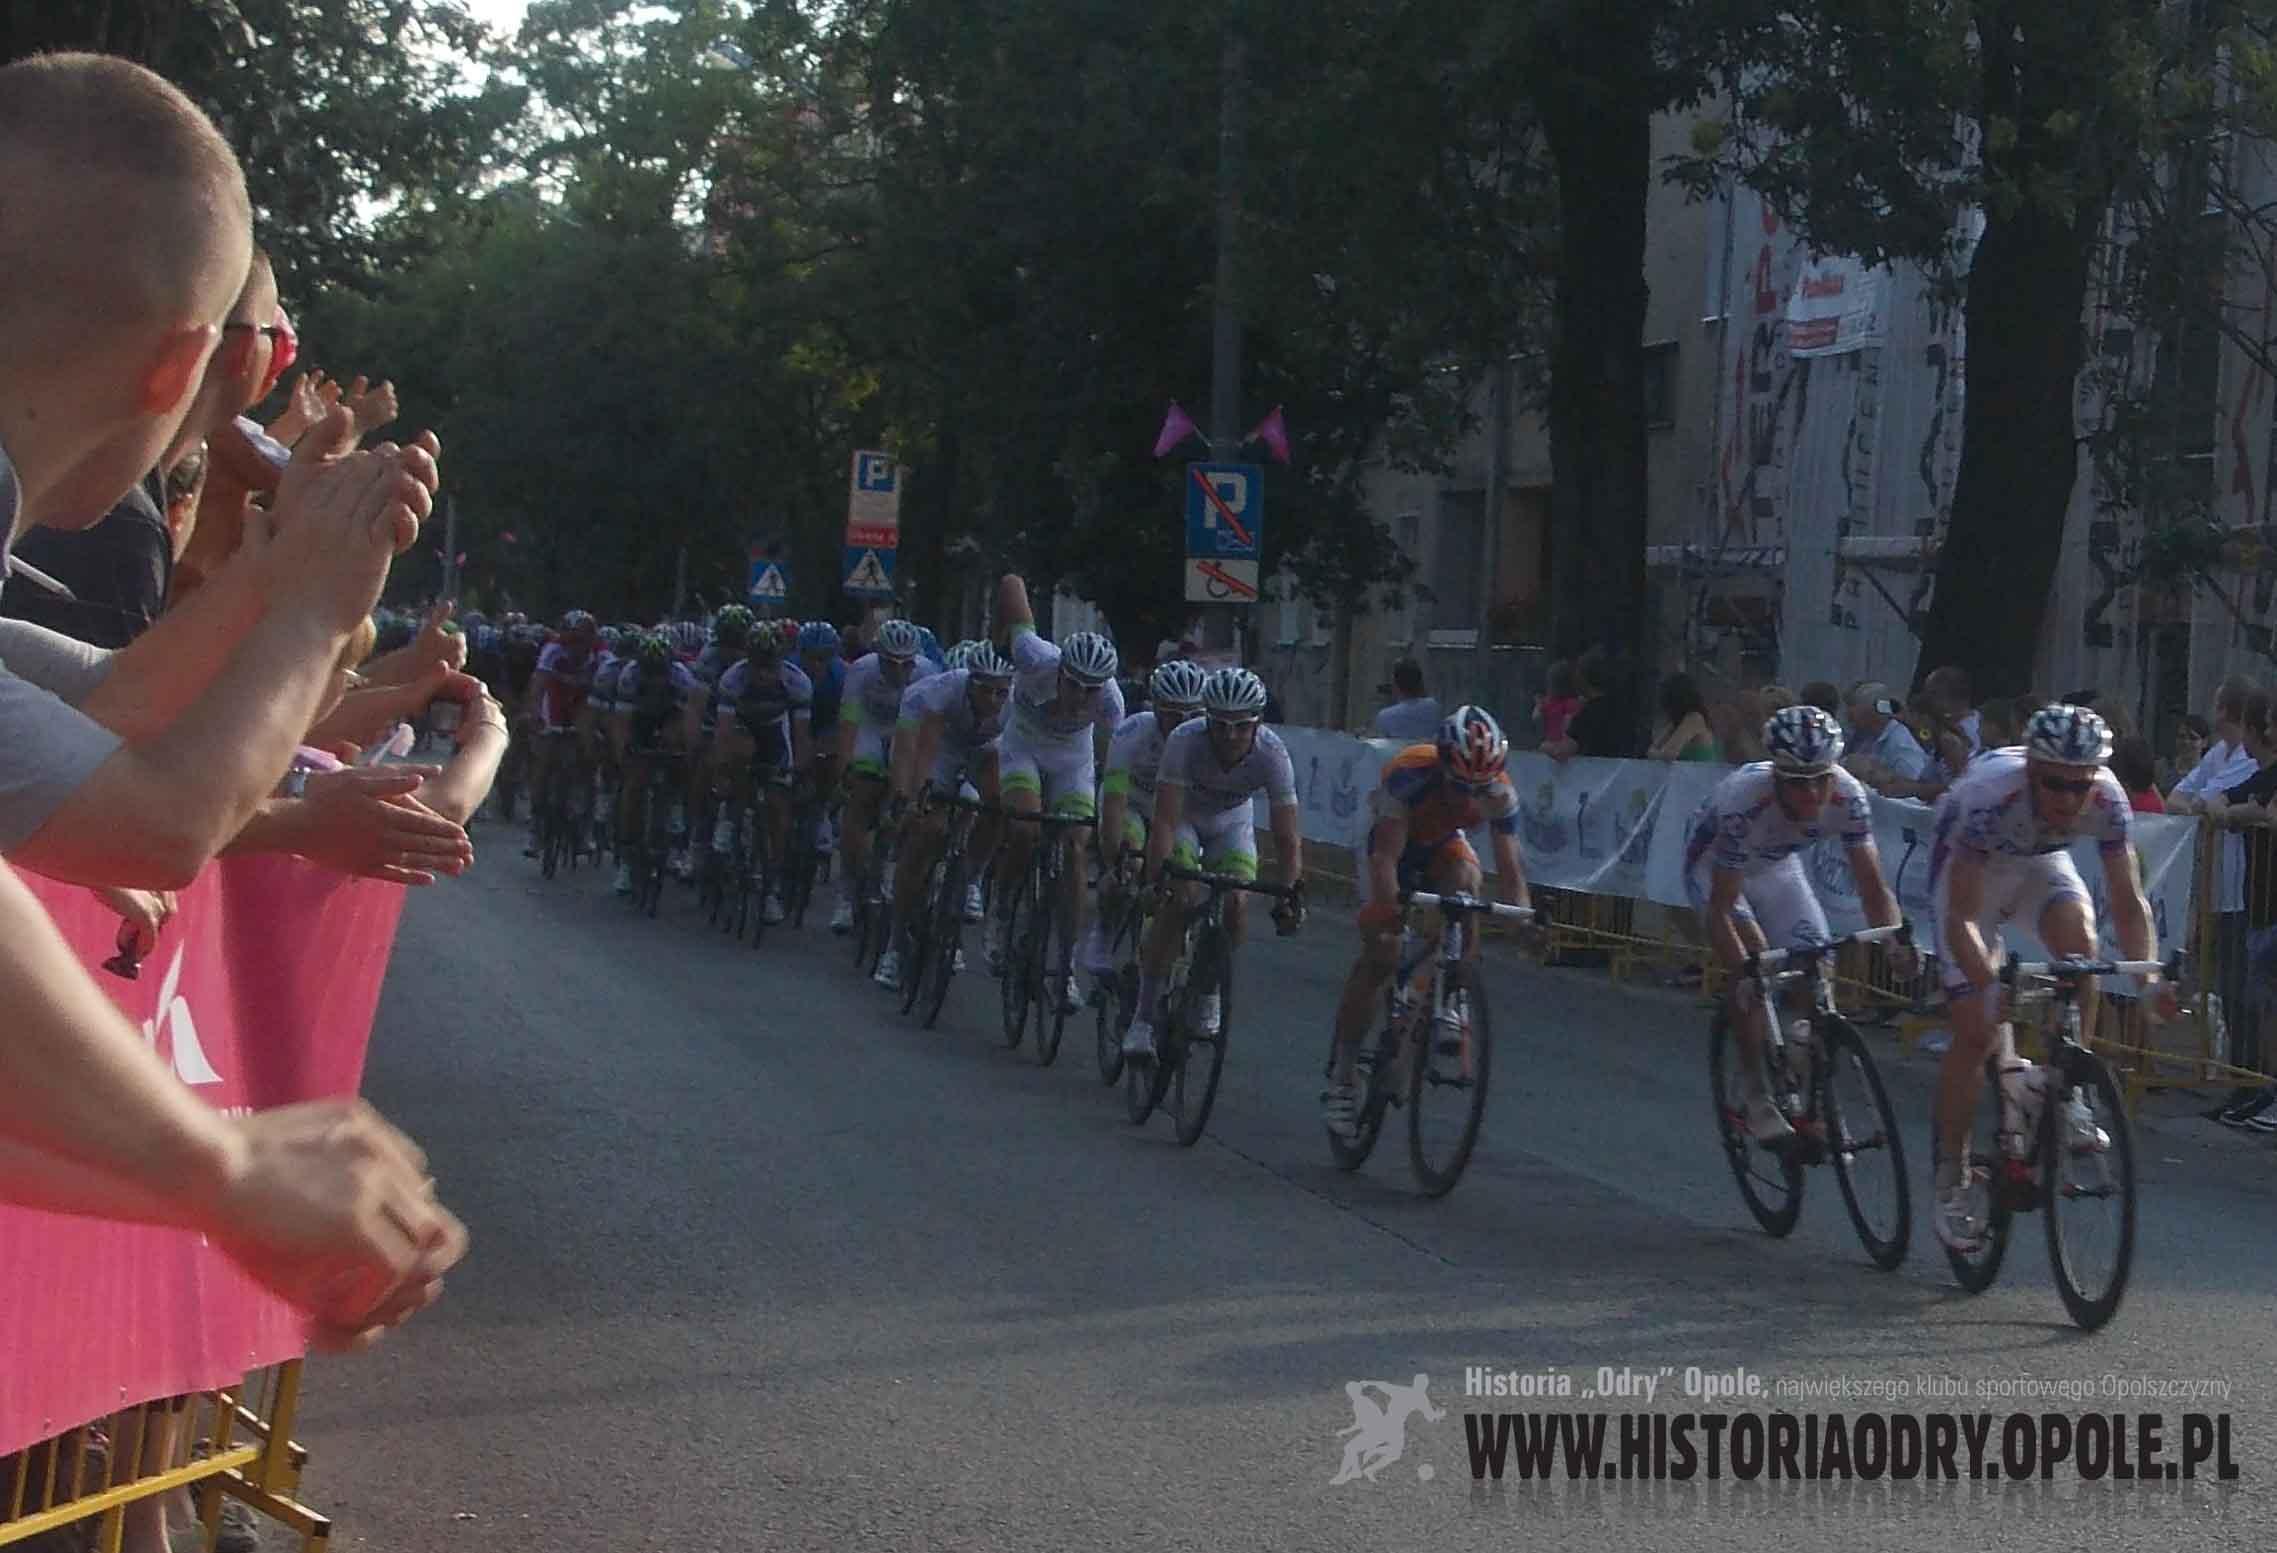 Tour de Pologne na ulicach Opola (3).